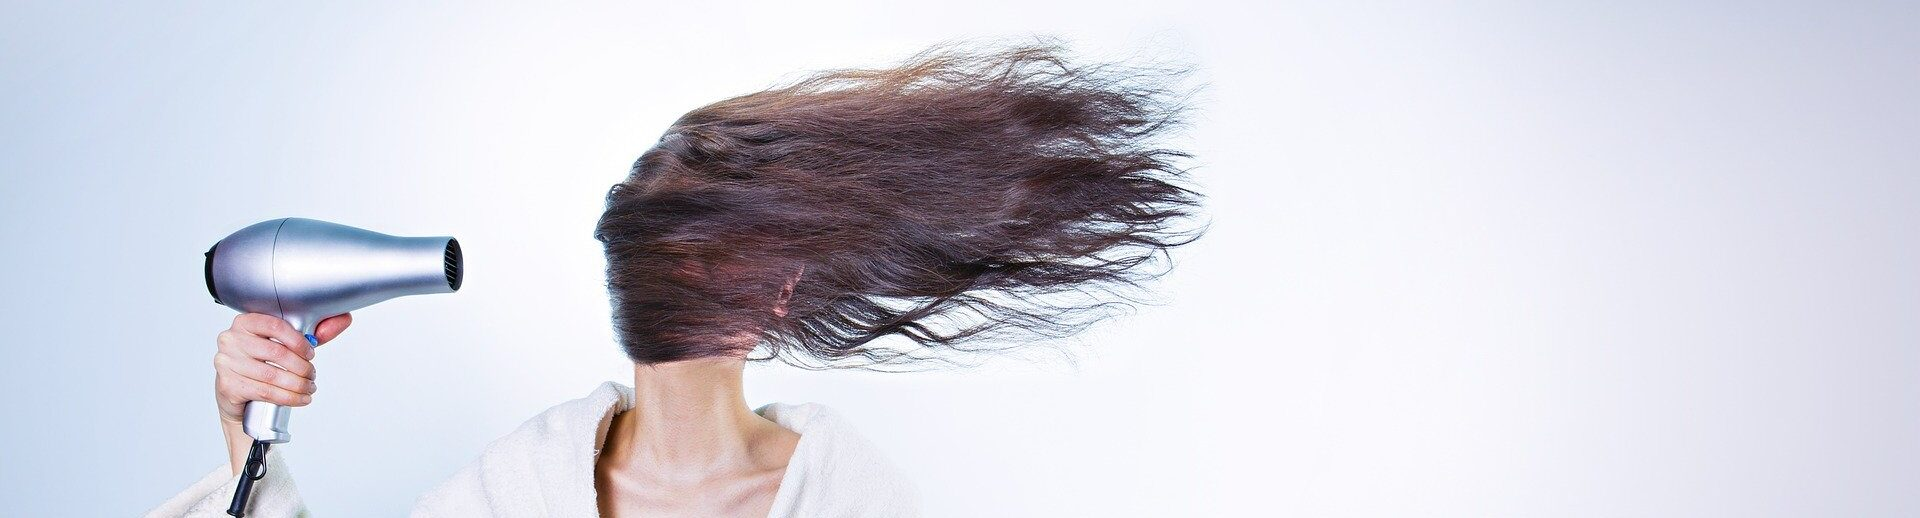 4 шага до красоты волос